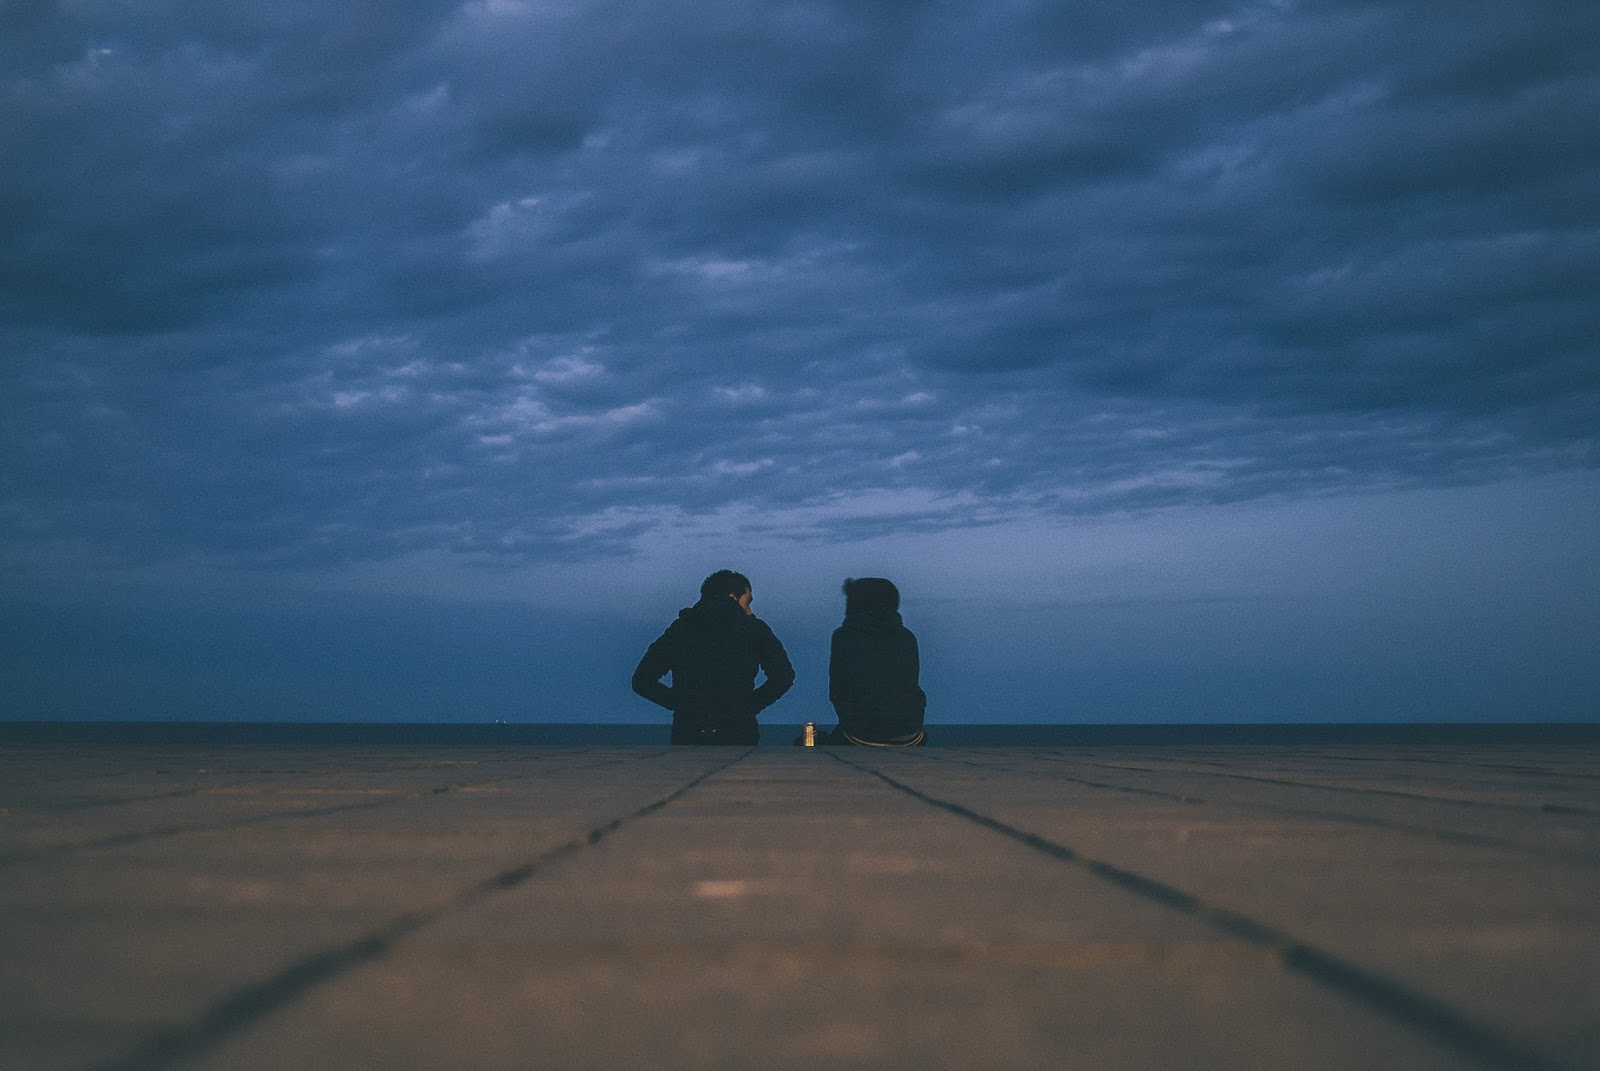 Cuplu rutină